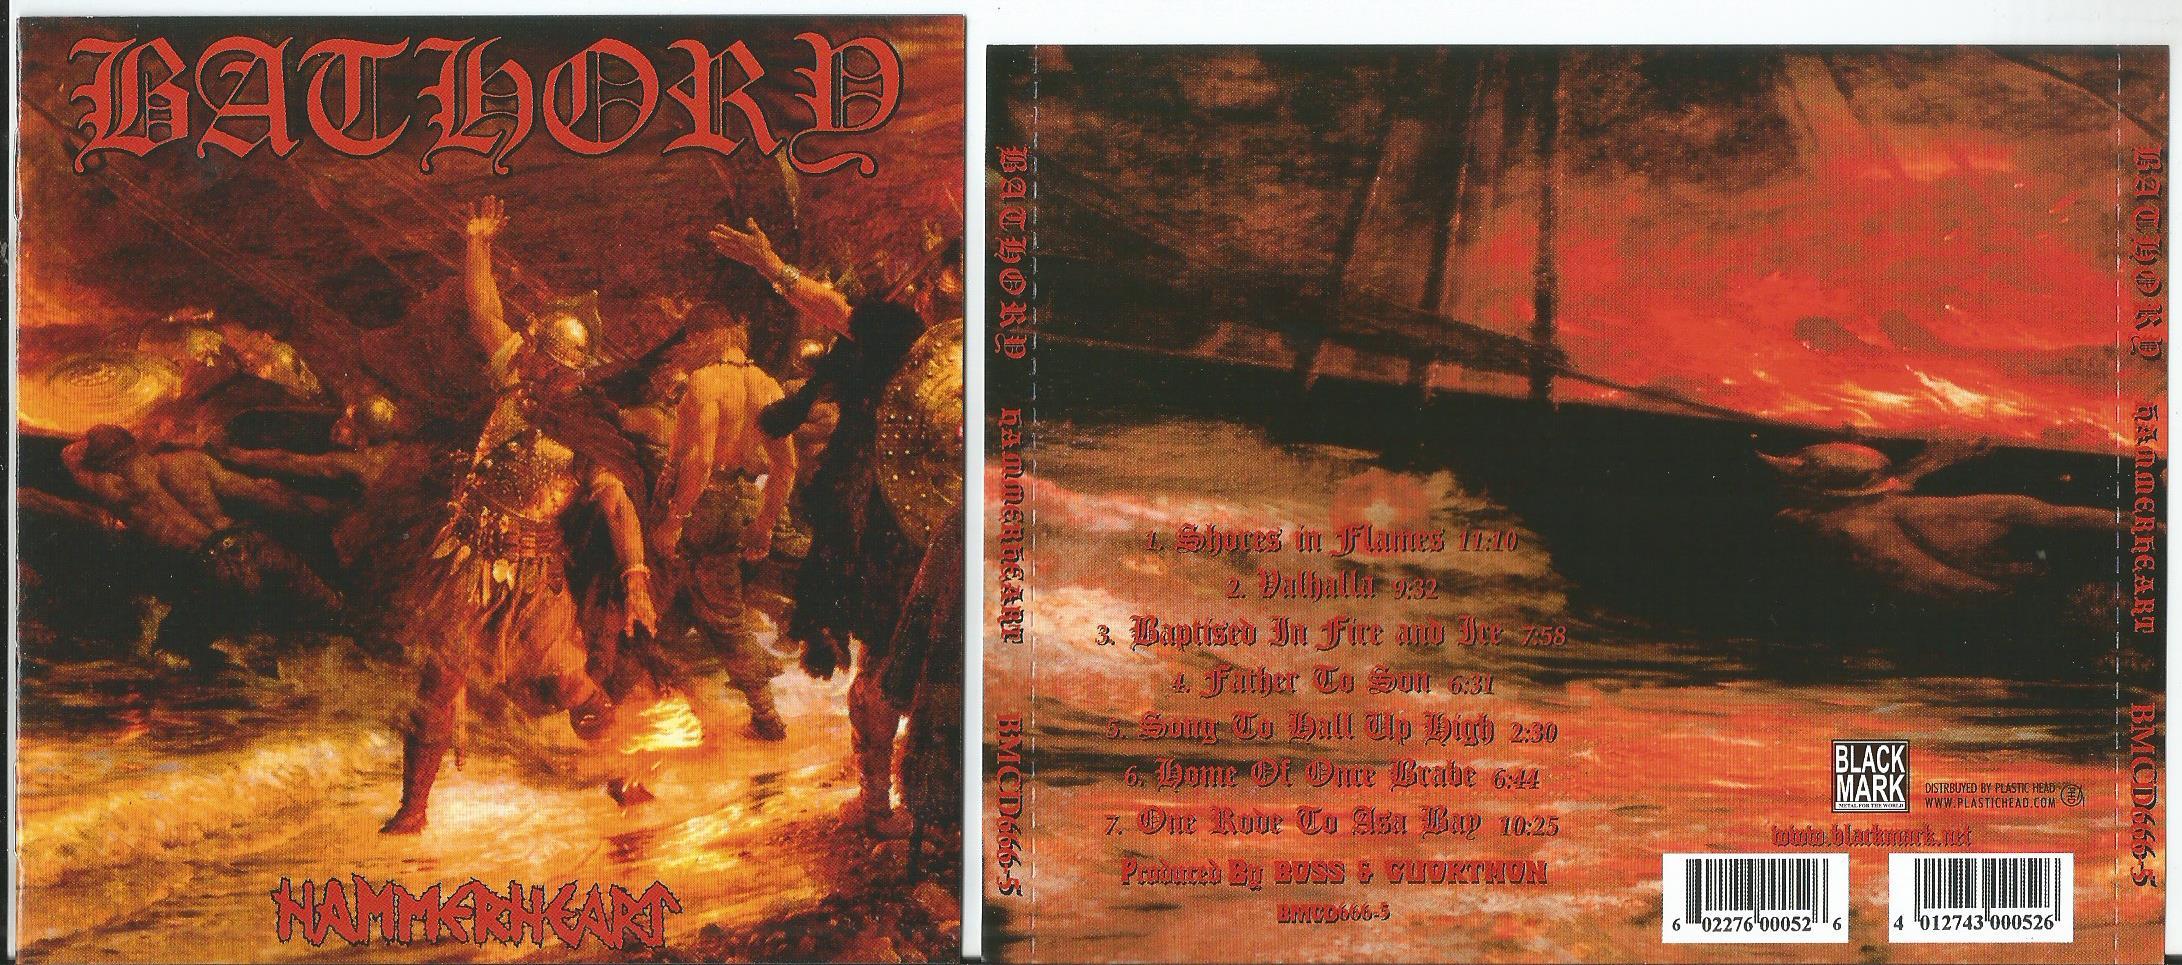 bathory hammerheart (8page booklet with lyrics)